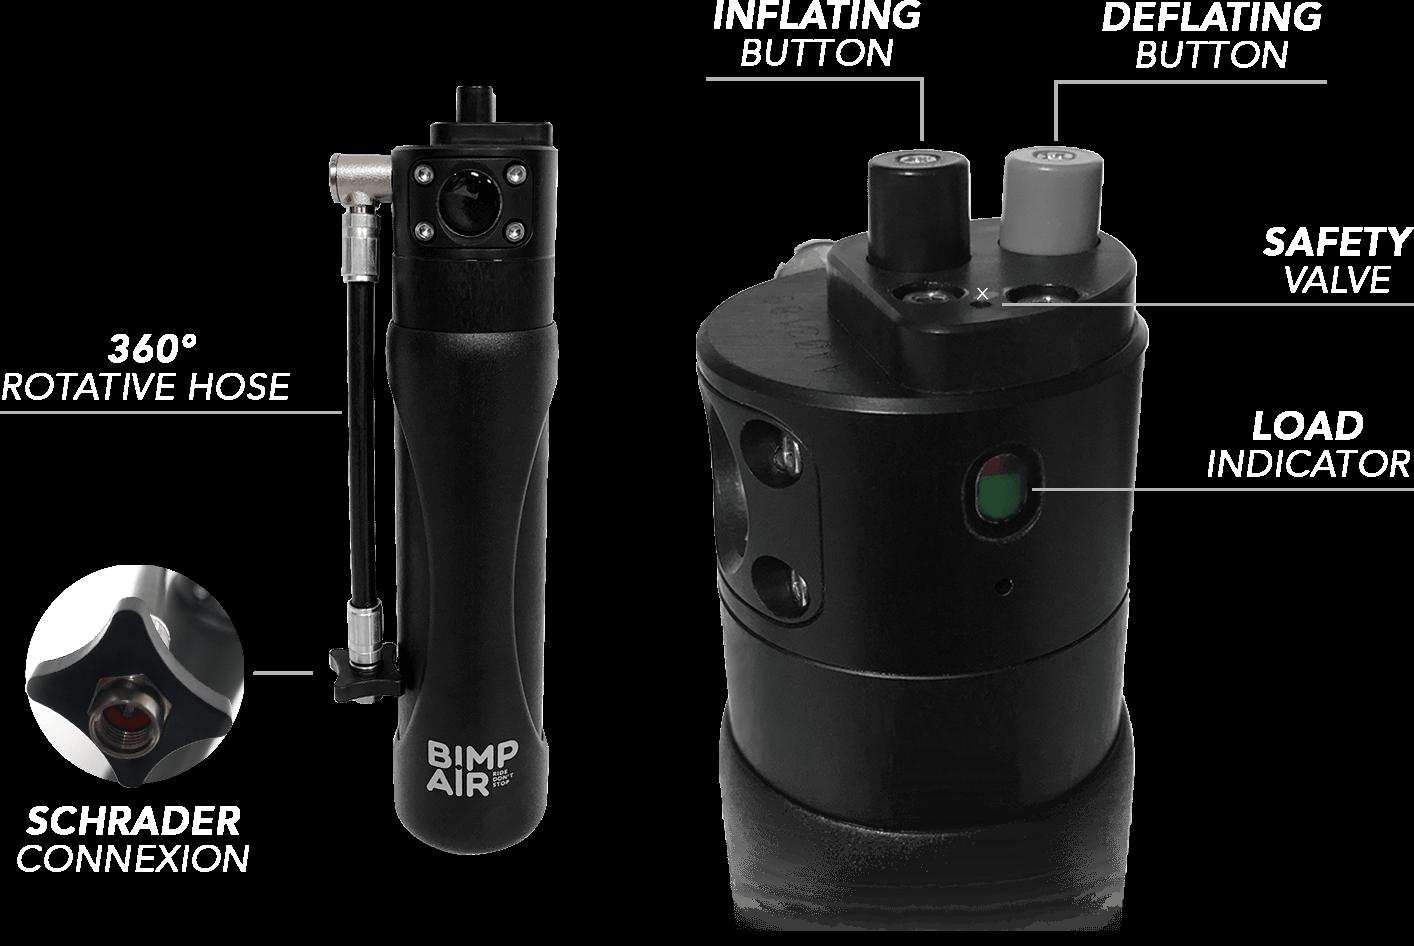 adjust suspensions pressure with the bimpair refillable cartridge